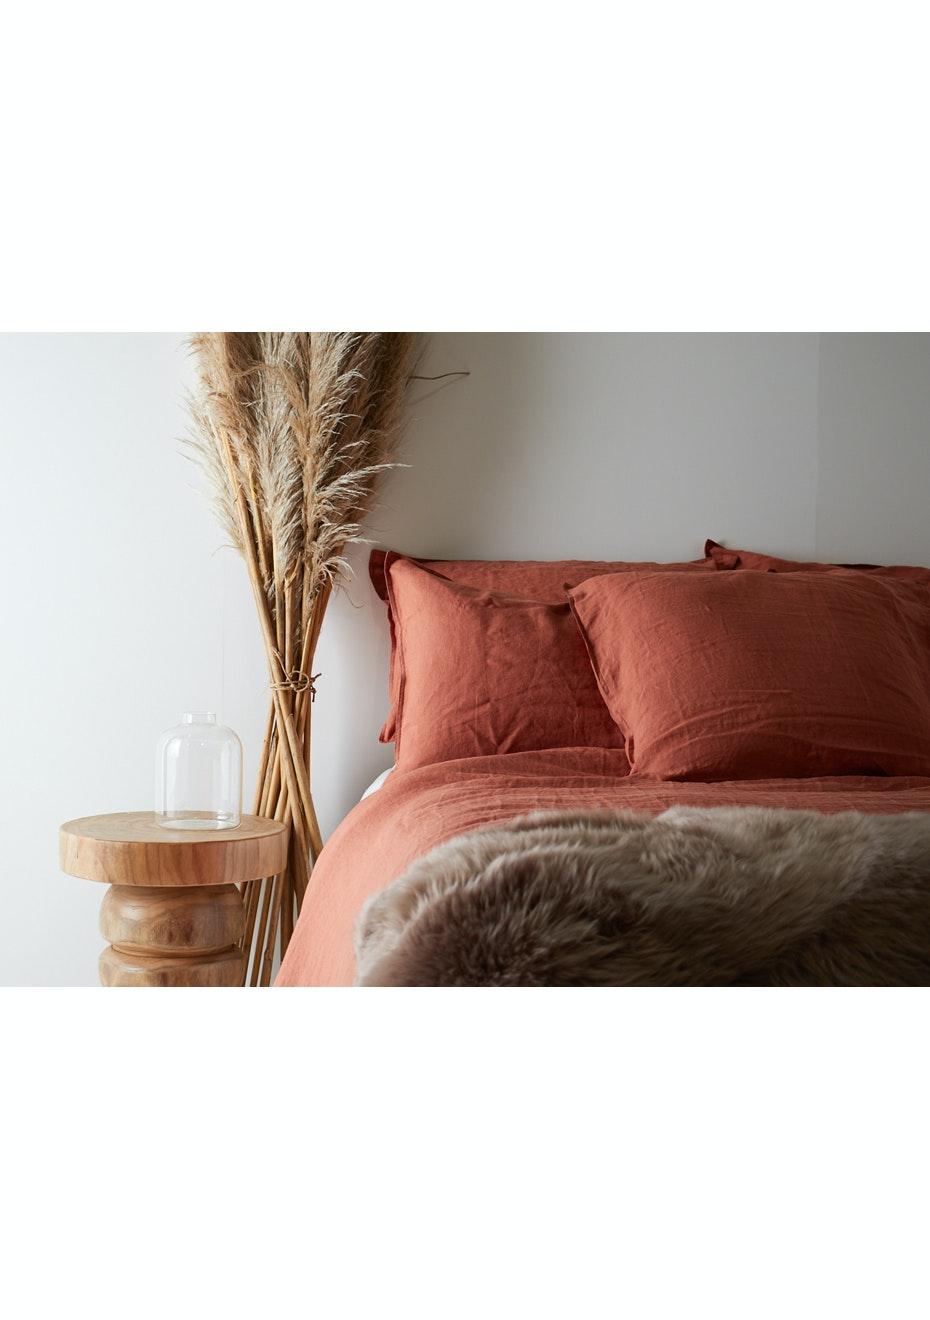 100 French Linen Duvet Cover Set Queen Desert Clay New Season 100 French Linen Bedding Onceit